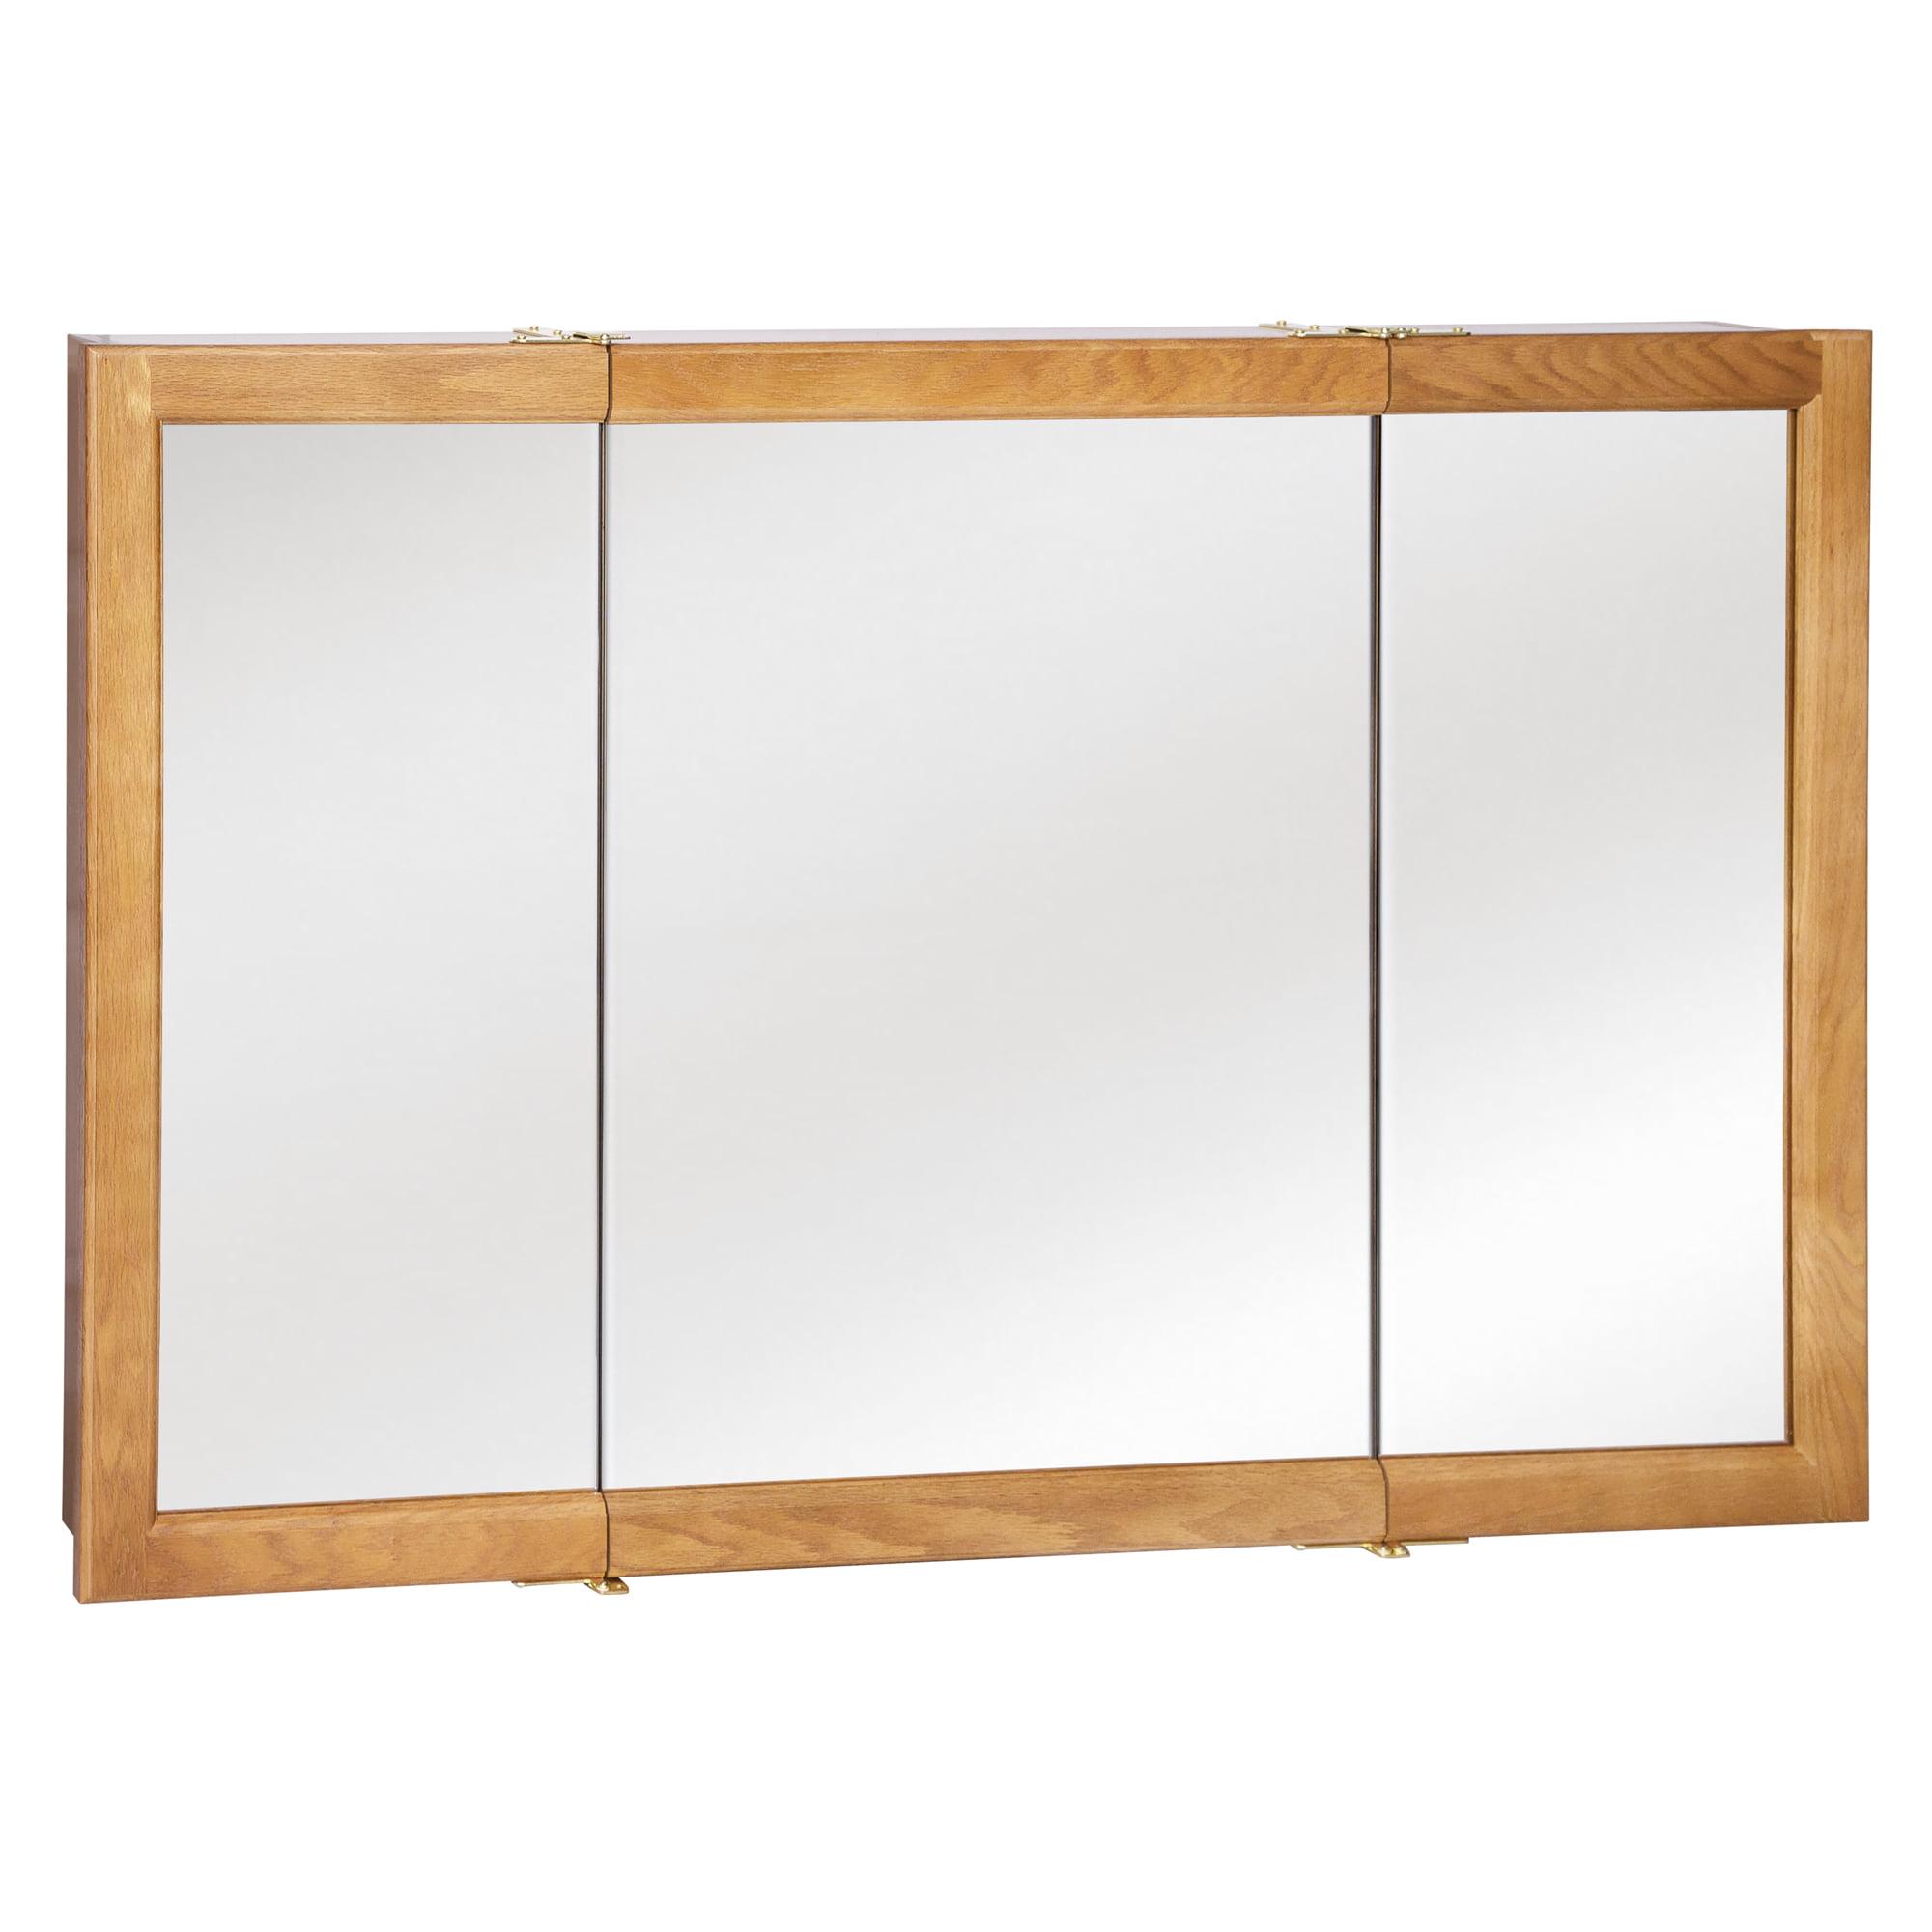 Design House 530584 Richland Tri View Medicine Cabinet Mirror 48 Nutmeg Oak Walmart Com Walmart Com